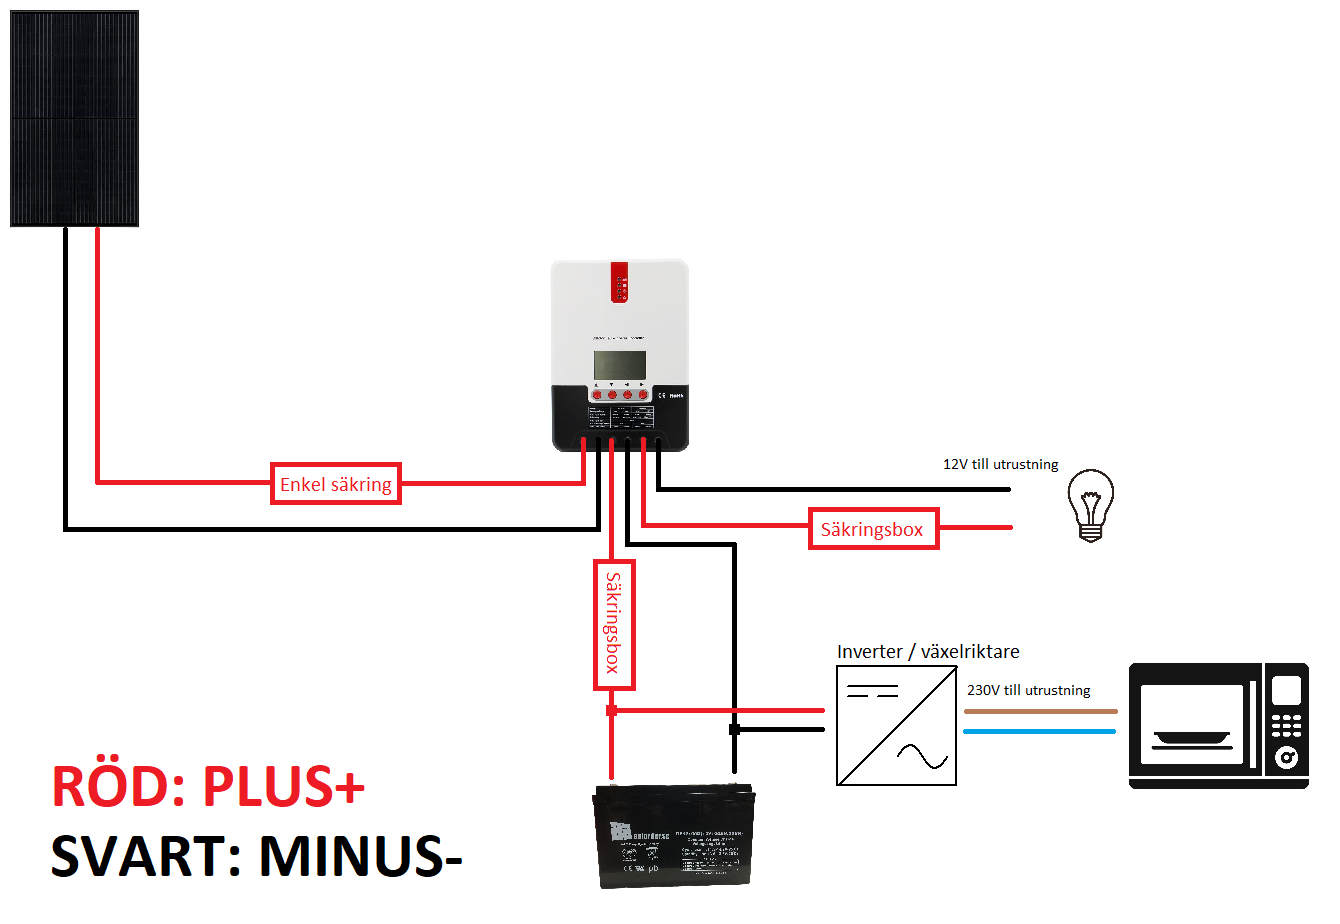 230V paket singelsolpanel singelbatteri